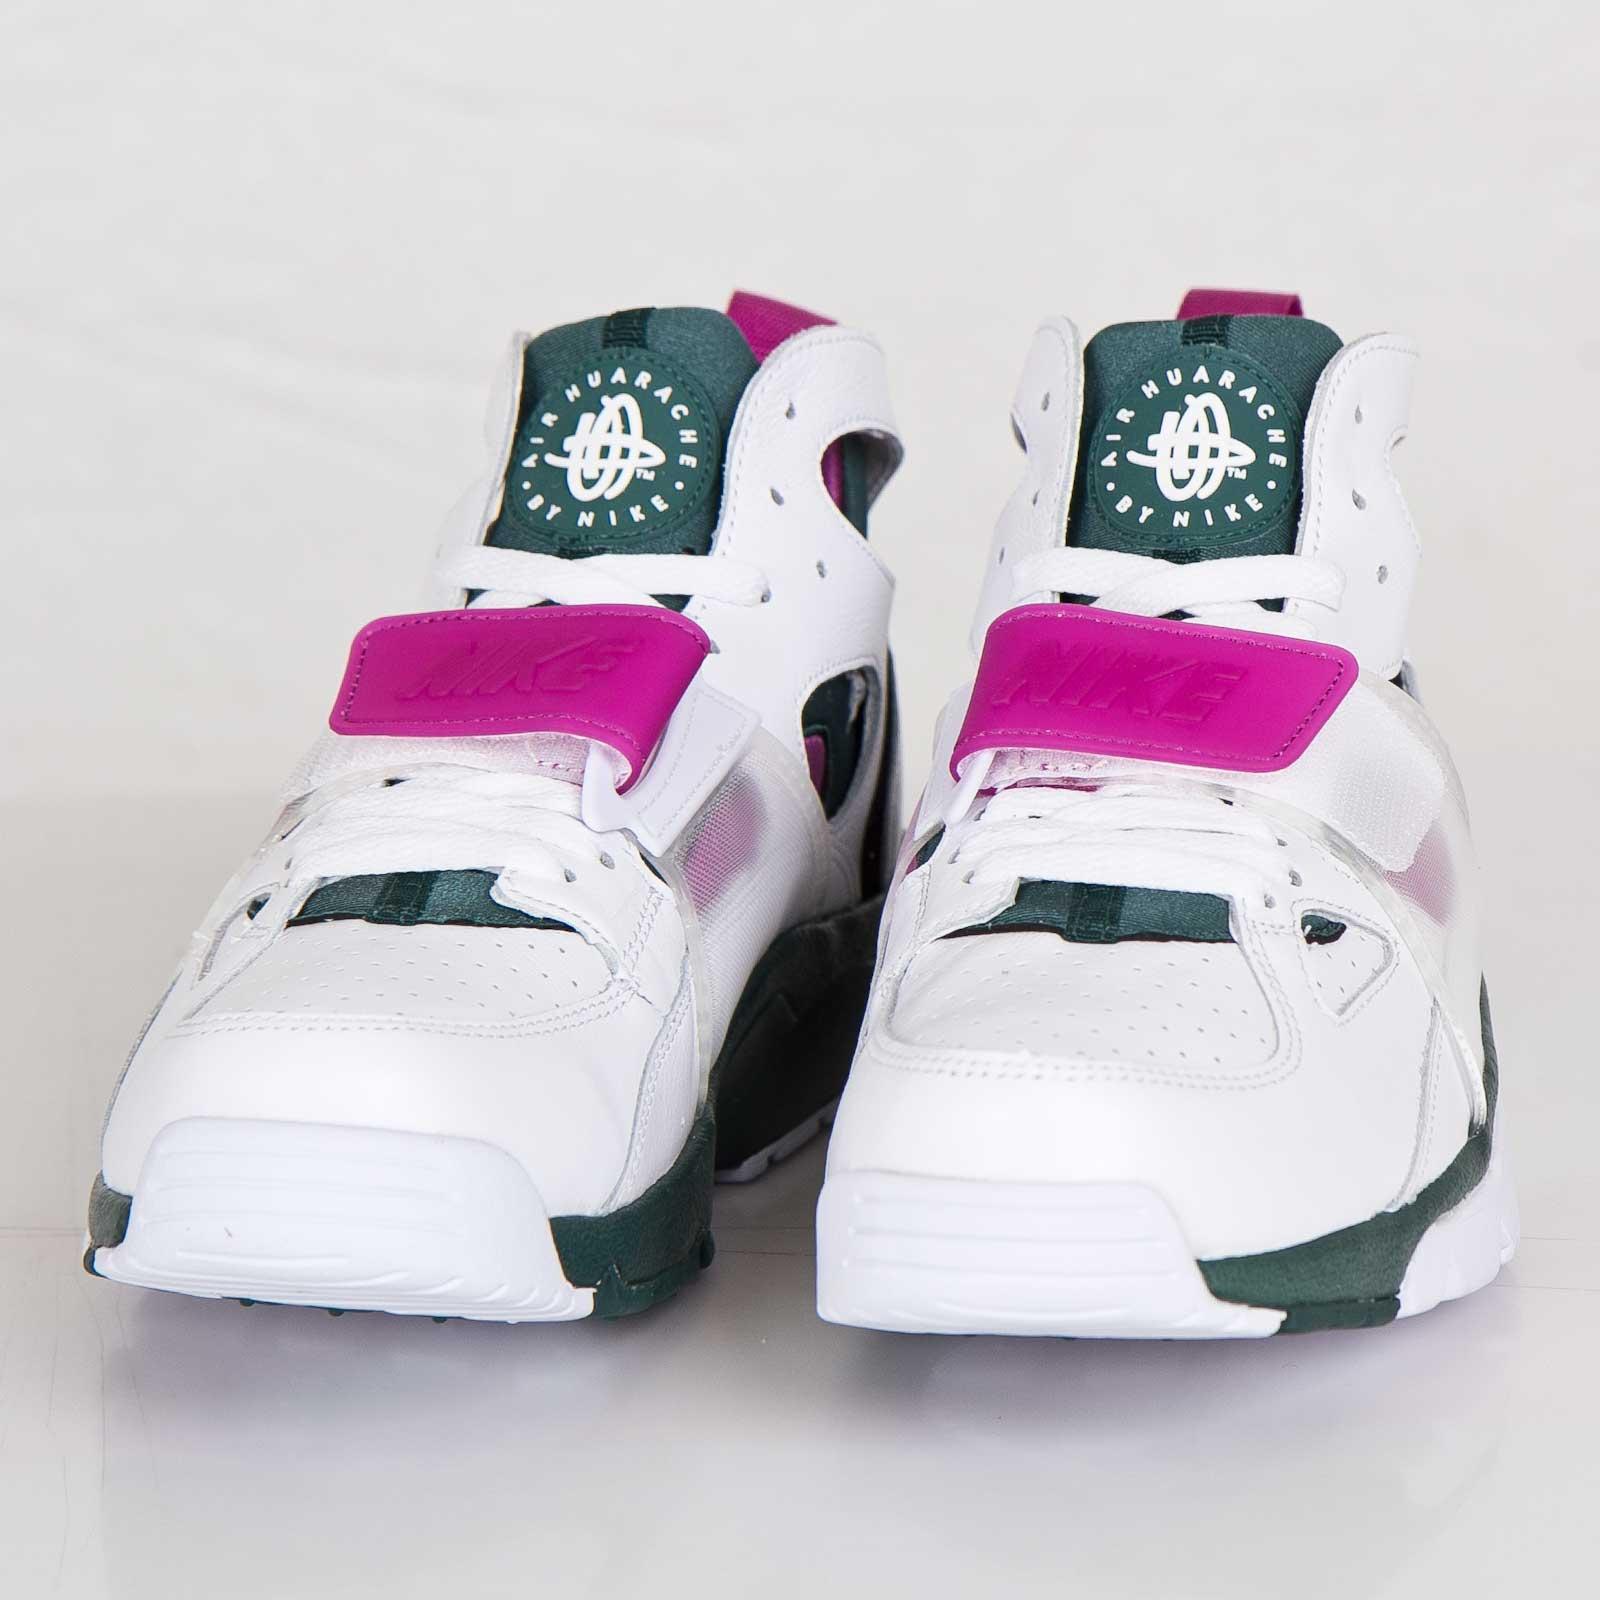 quality design fbafc da386 Nike Air Trainer Huarache Premium QS - 647591-100 - Sneakersnstuff    sneakers   streetwear online since 1999